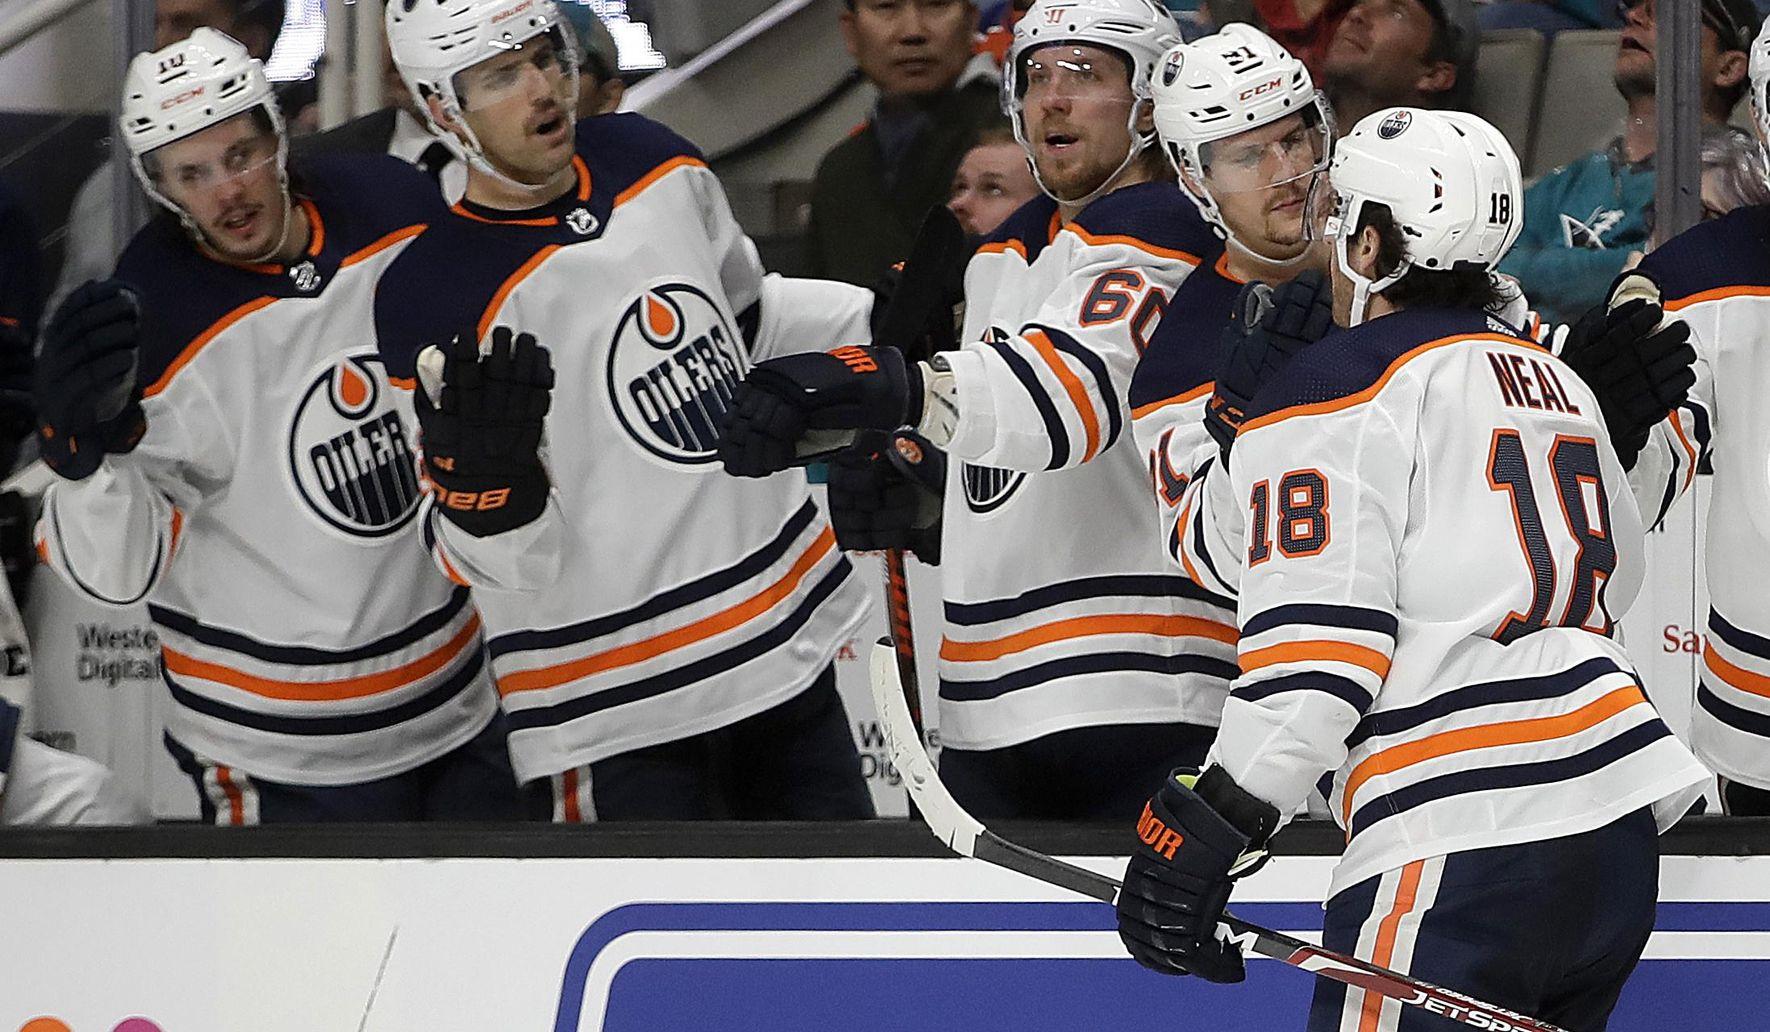 Oilers_sharks_hockey_13988_c0-138-2197-1418_s1770x1032